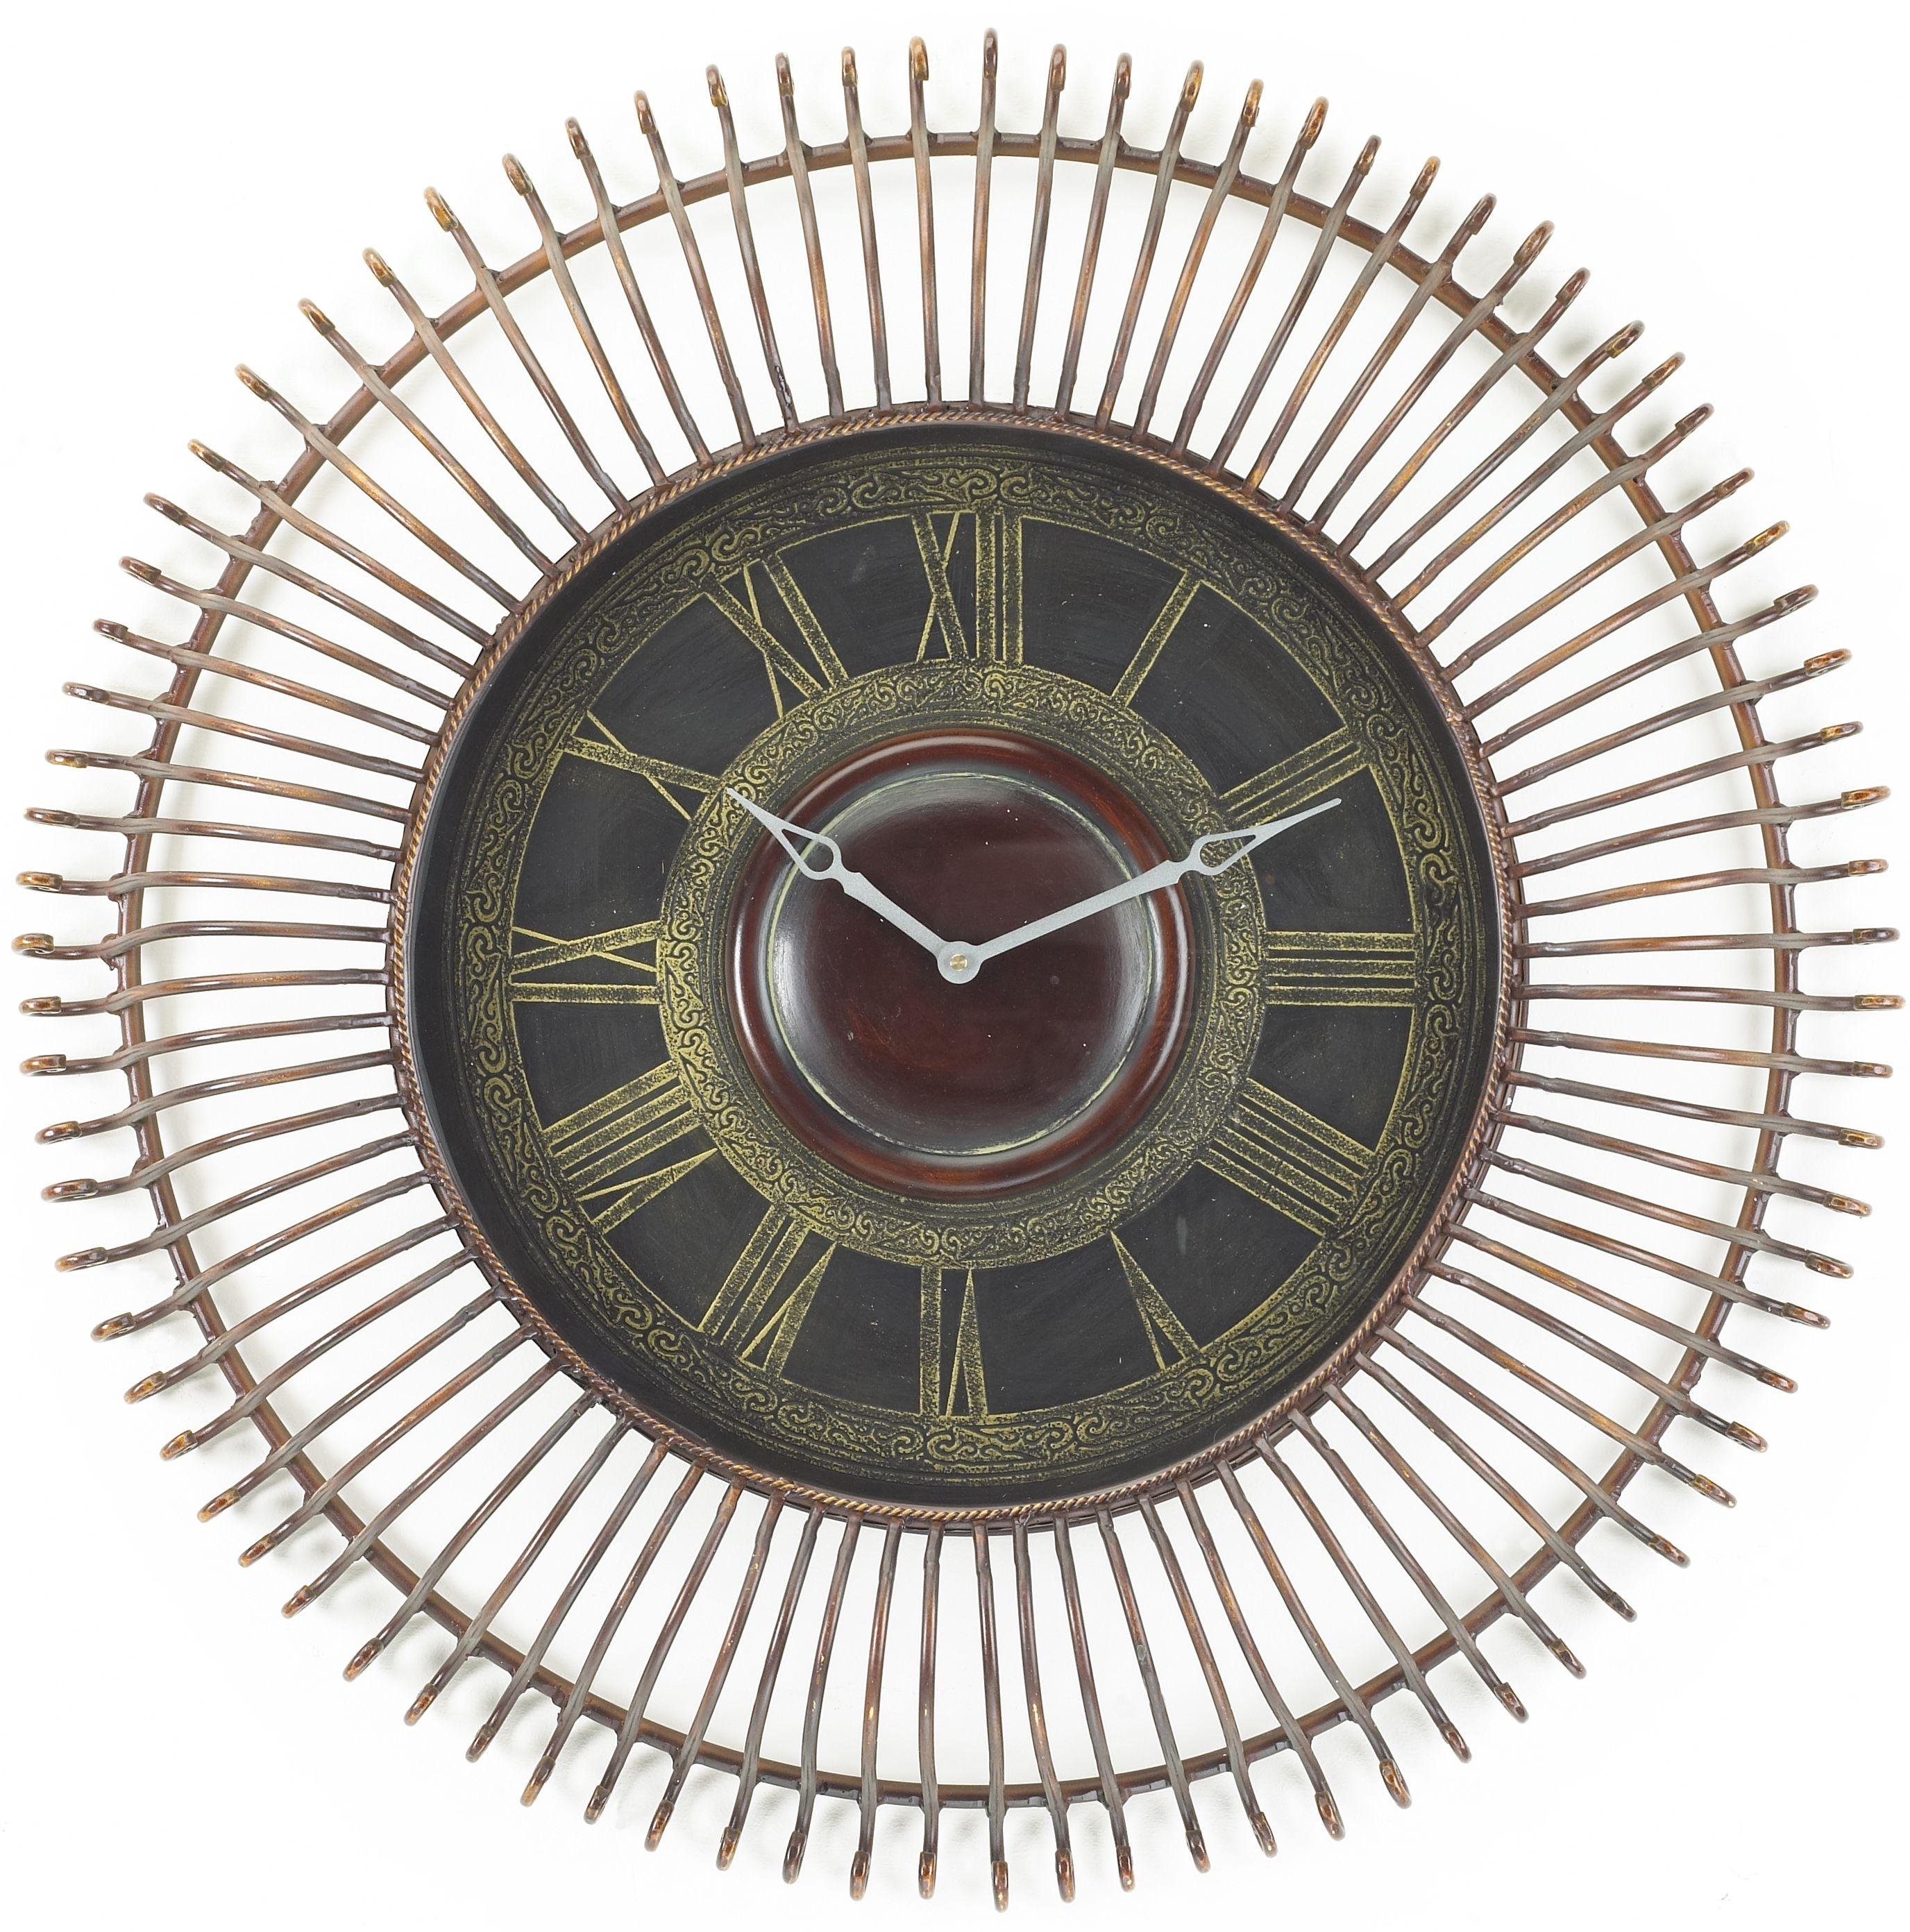 Large metal art wall clock phiaraehomelargewallclock